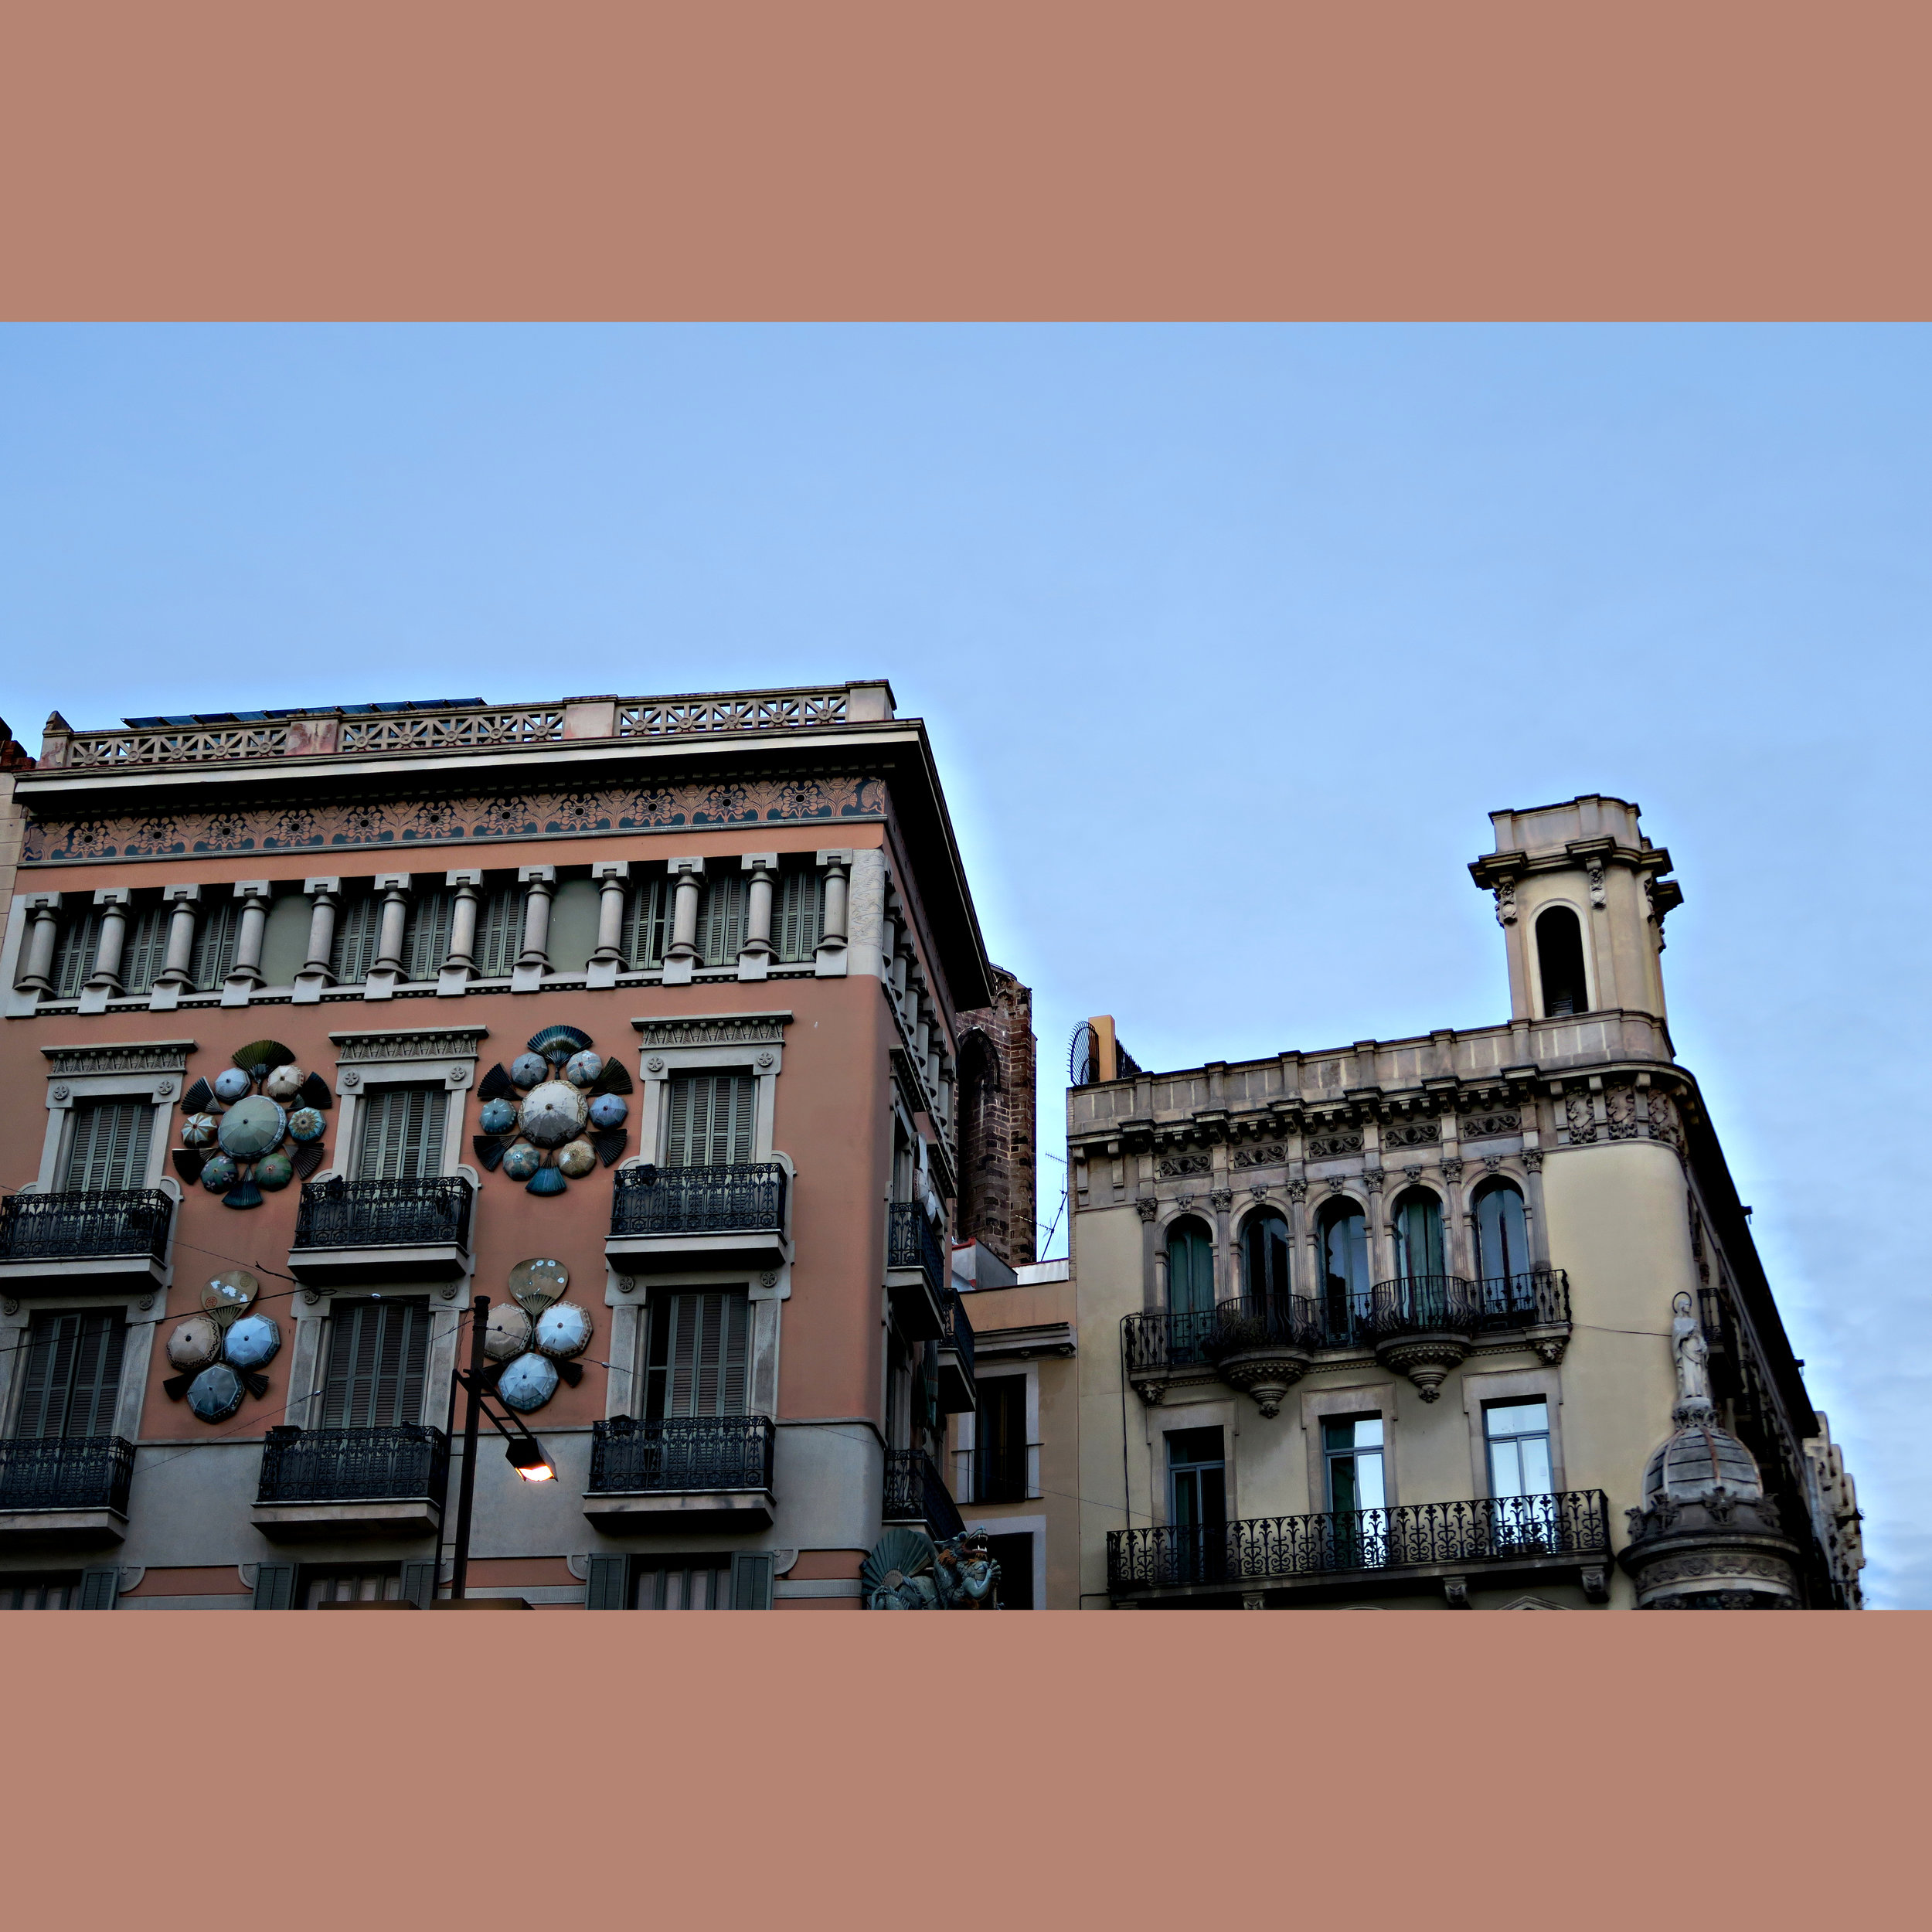 BarcelonaBuildings.jpg